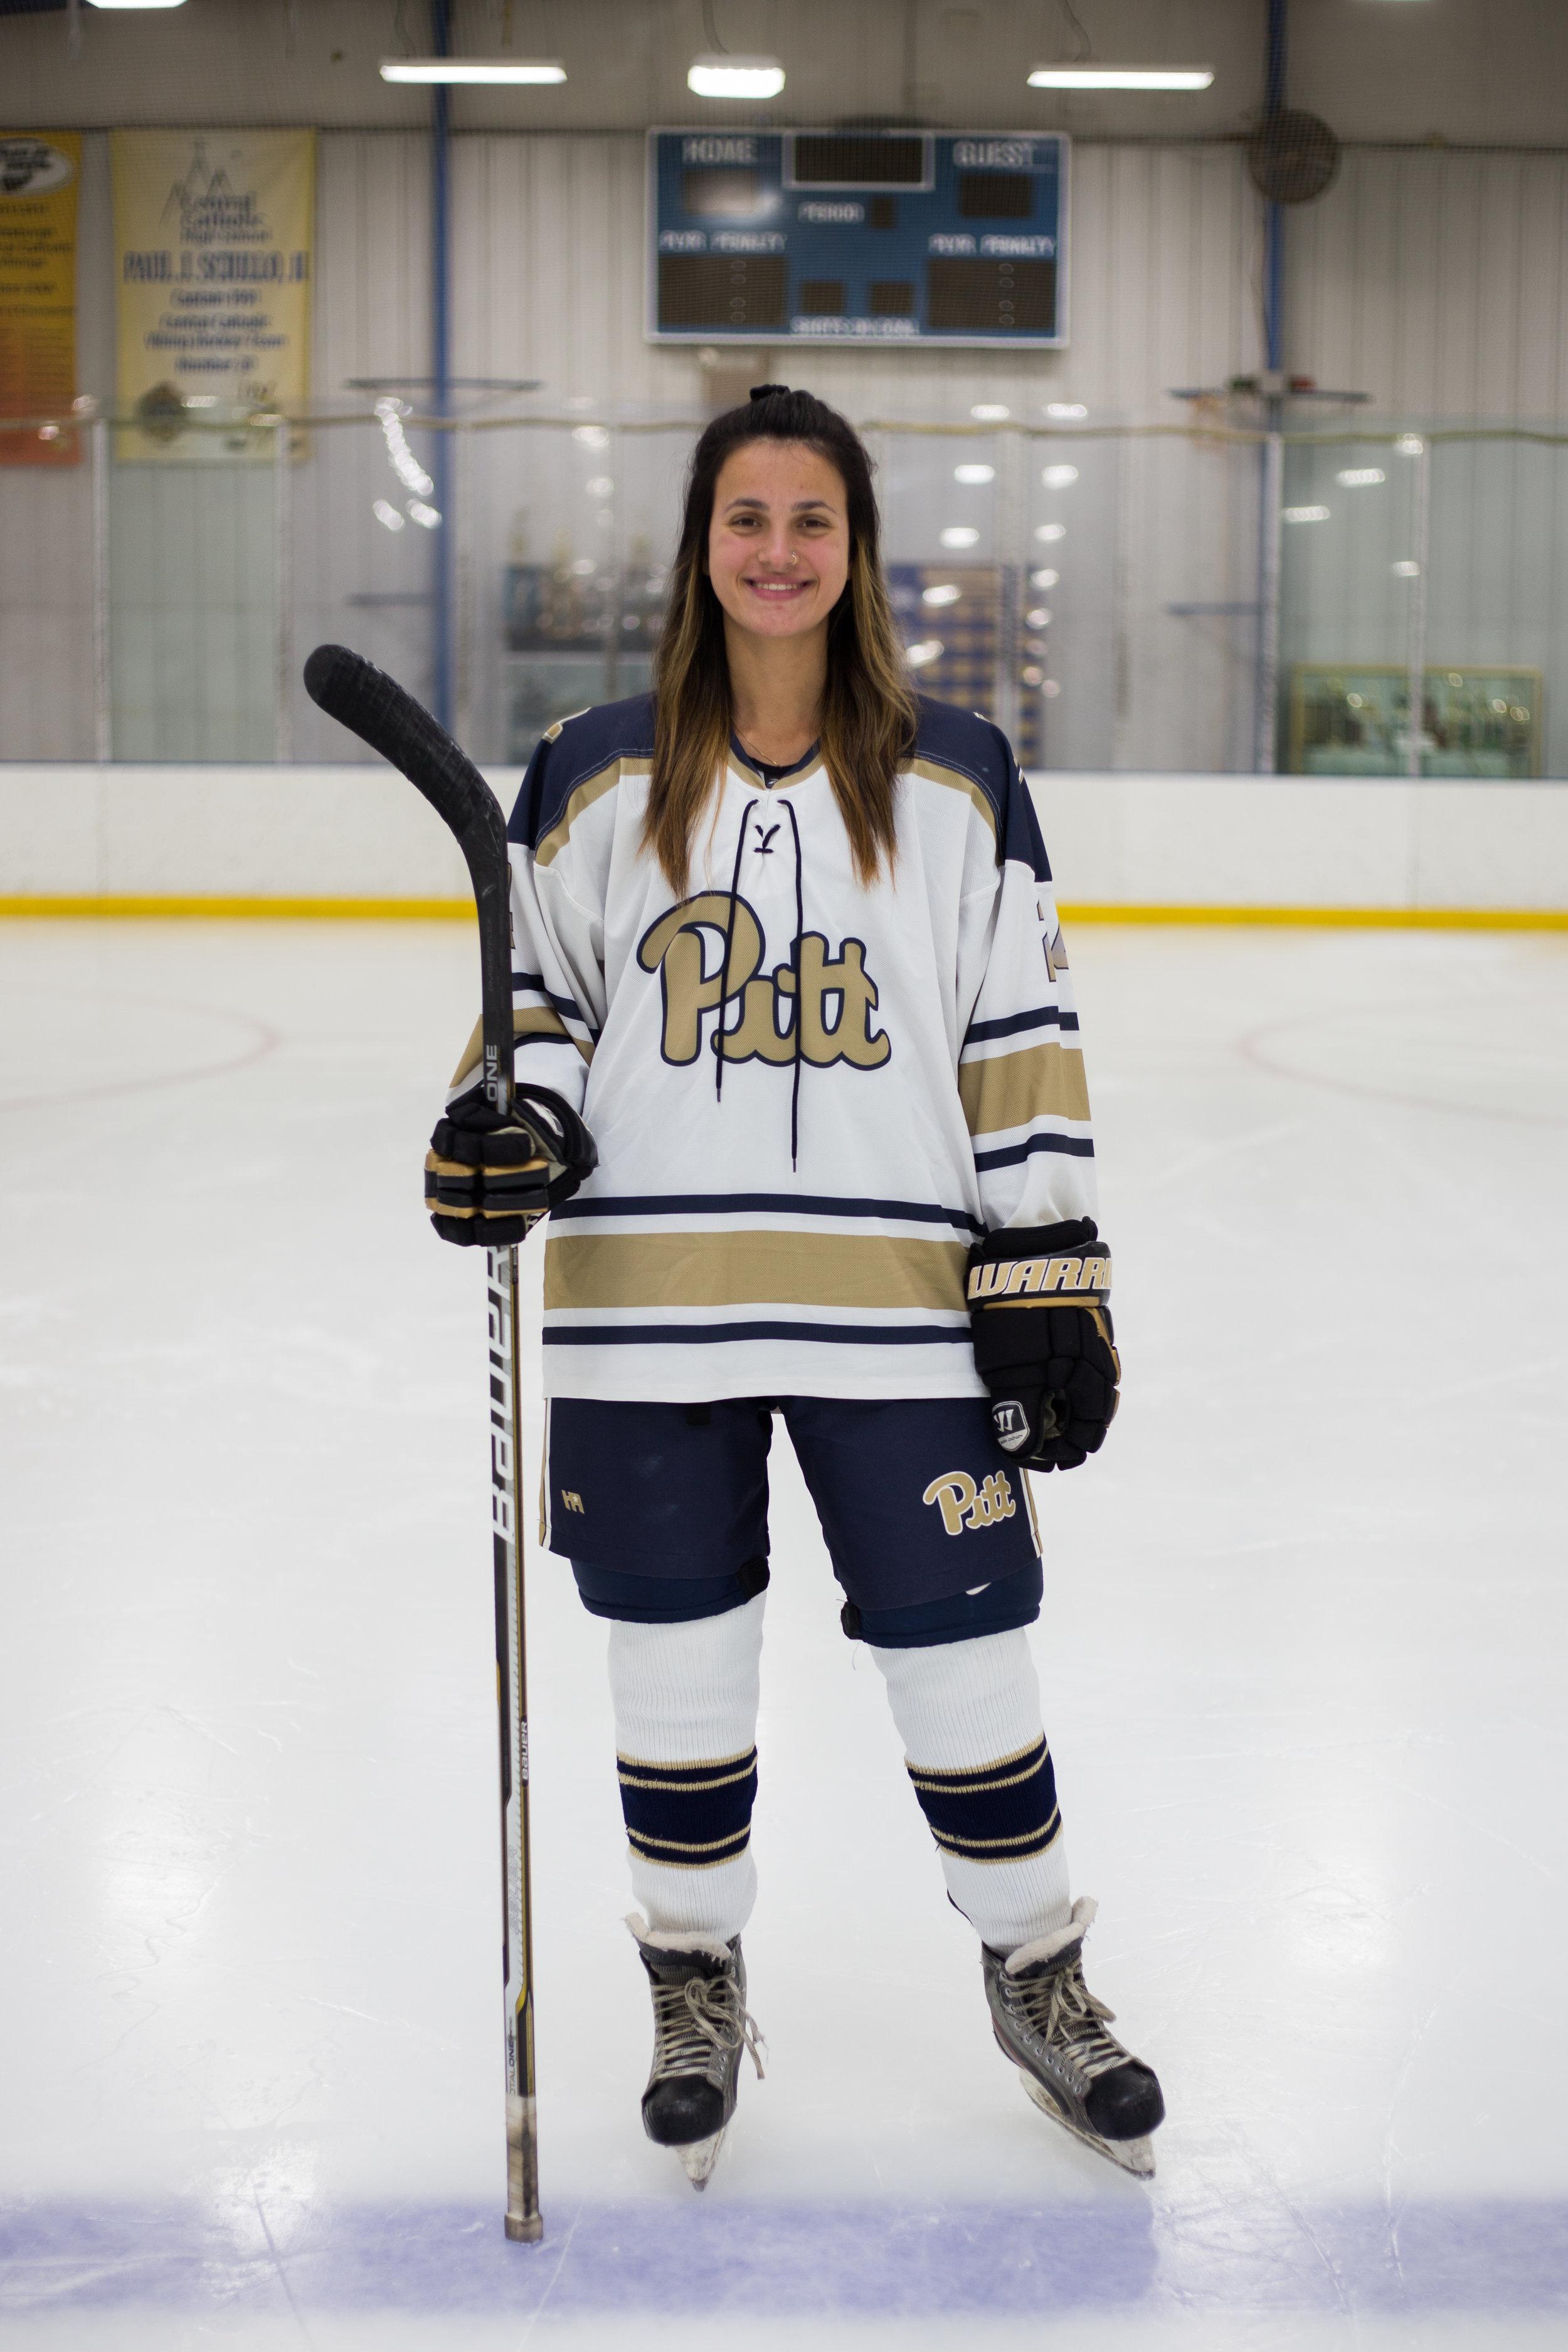 hockeyPortraits-1.JPG